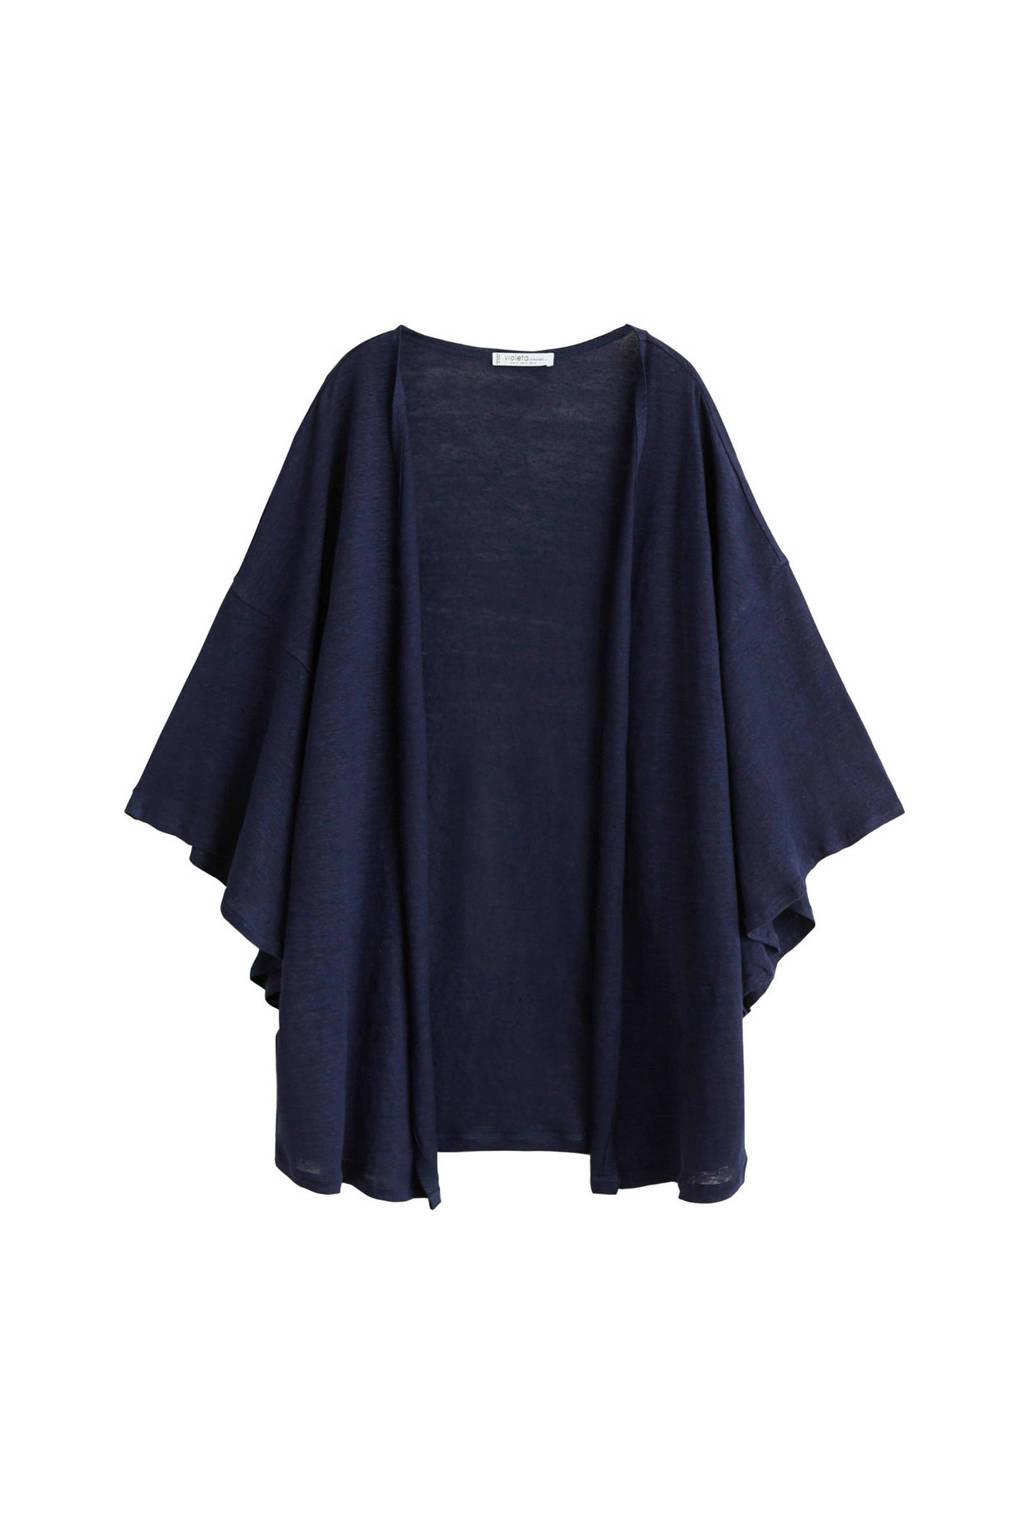 Violeta by Mango vest donkerblauw, Donkerblauw